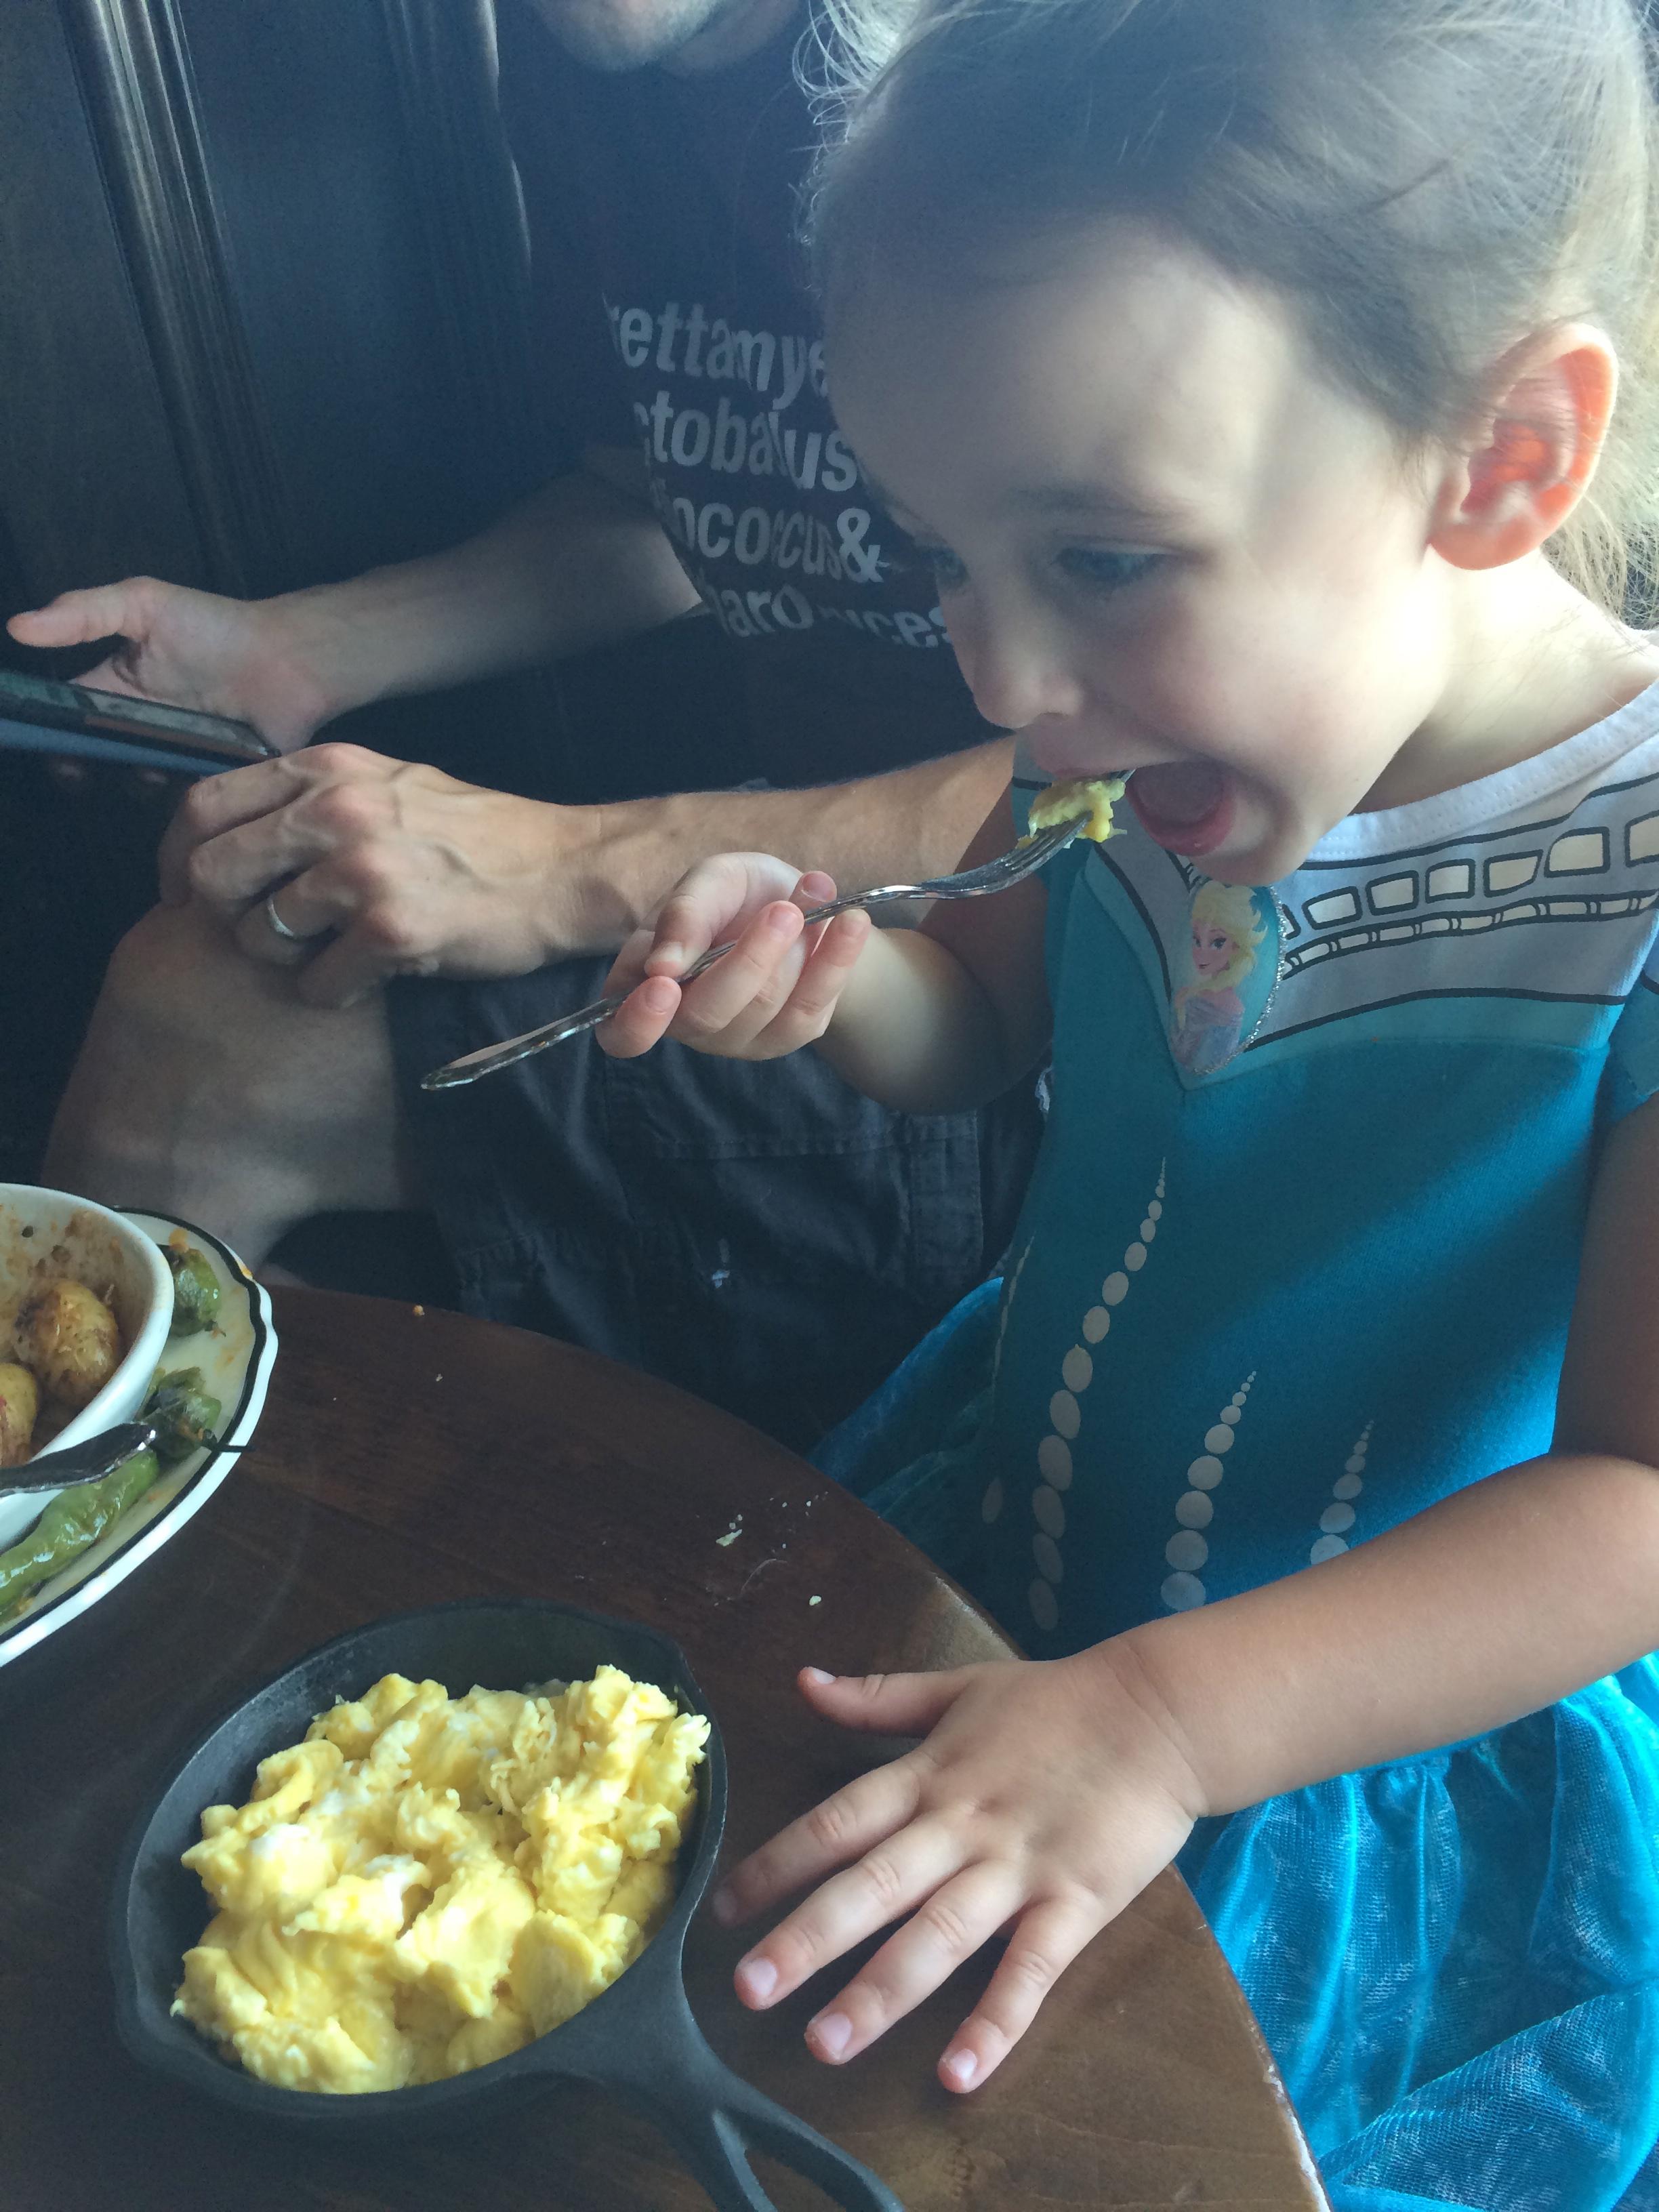 D got her own mini frying pan of eggs